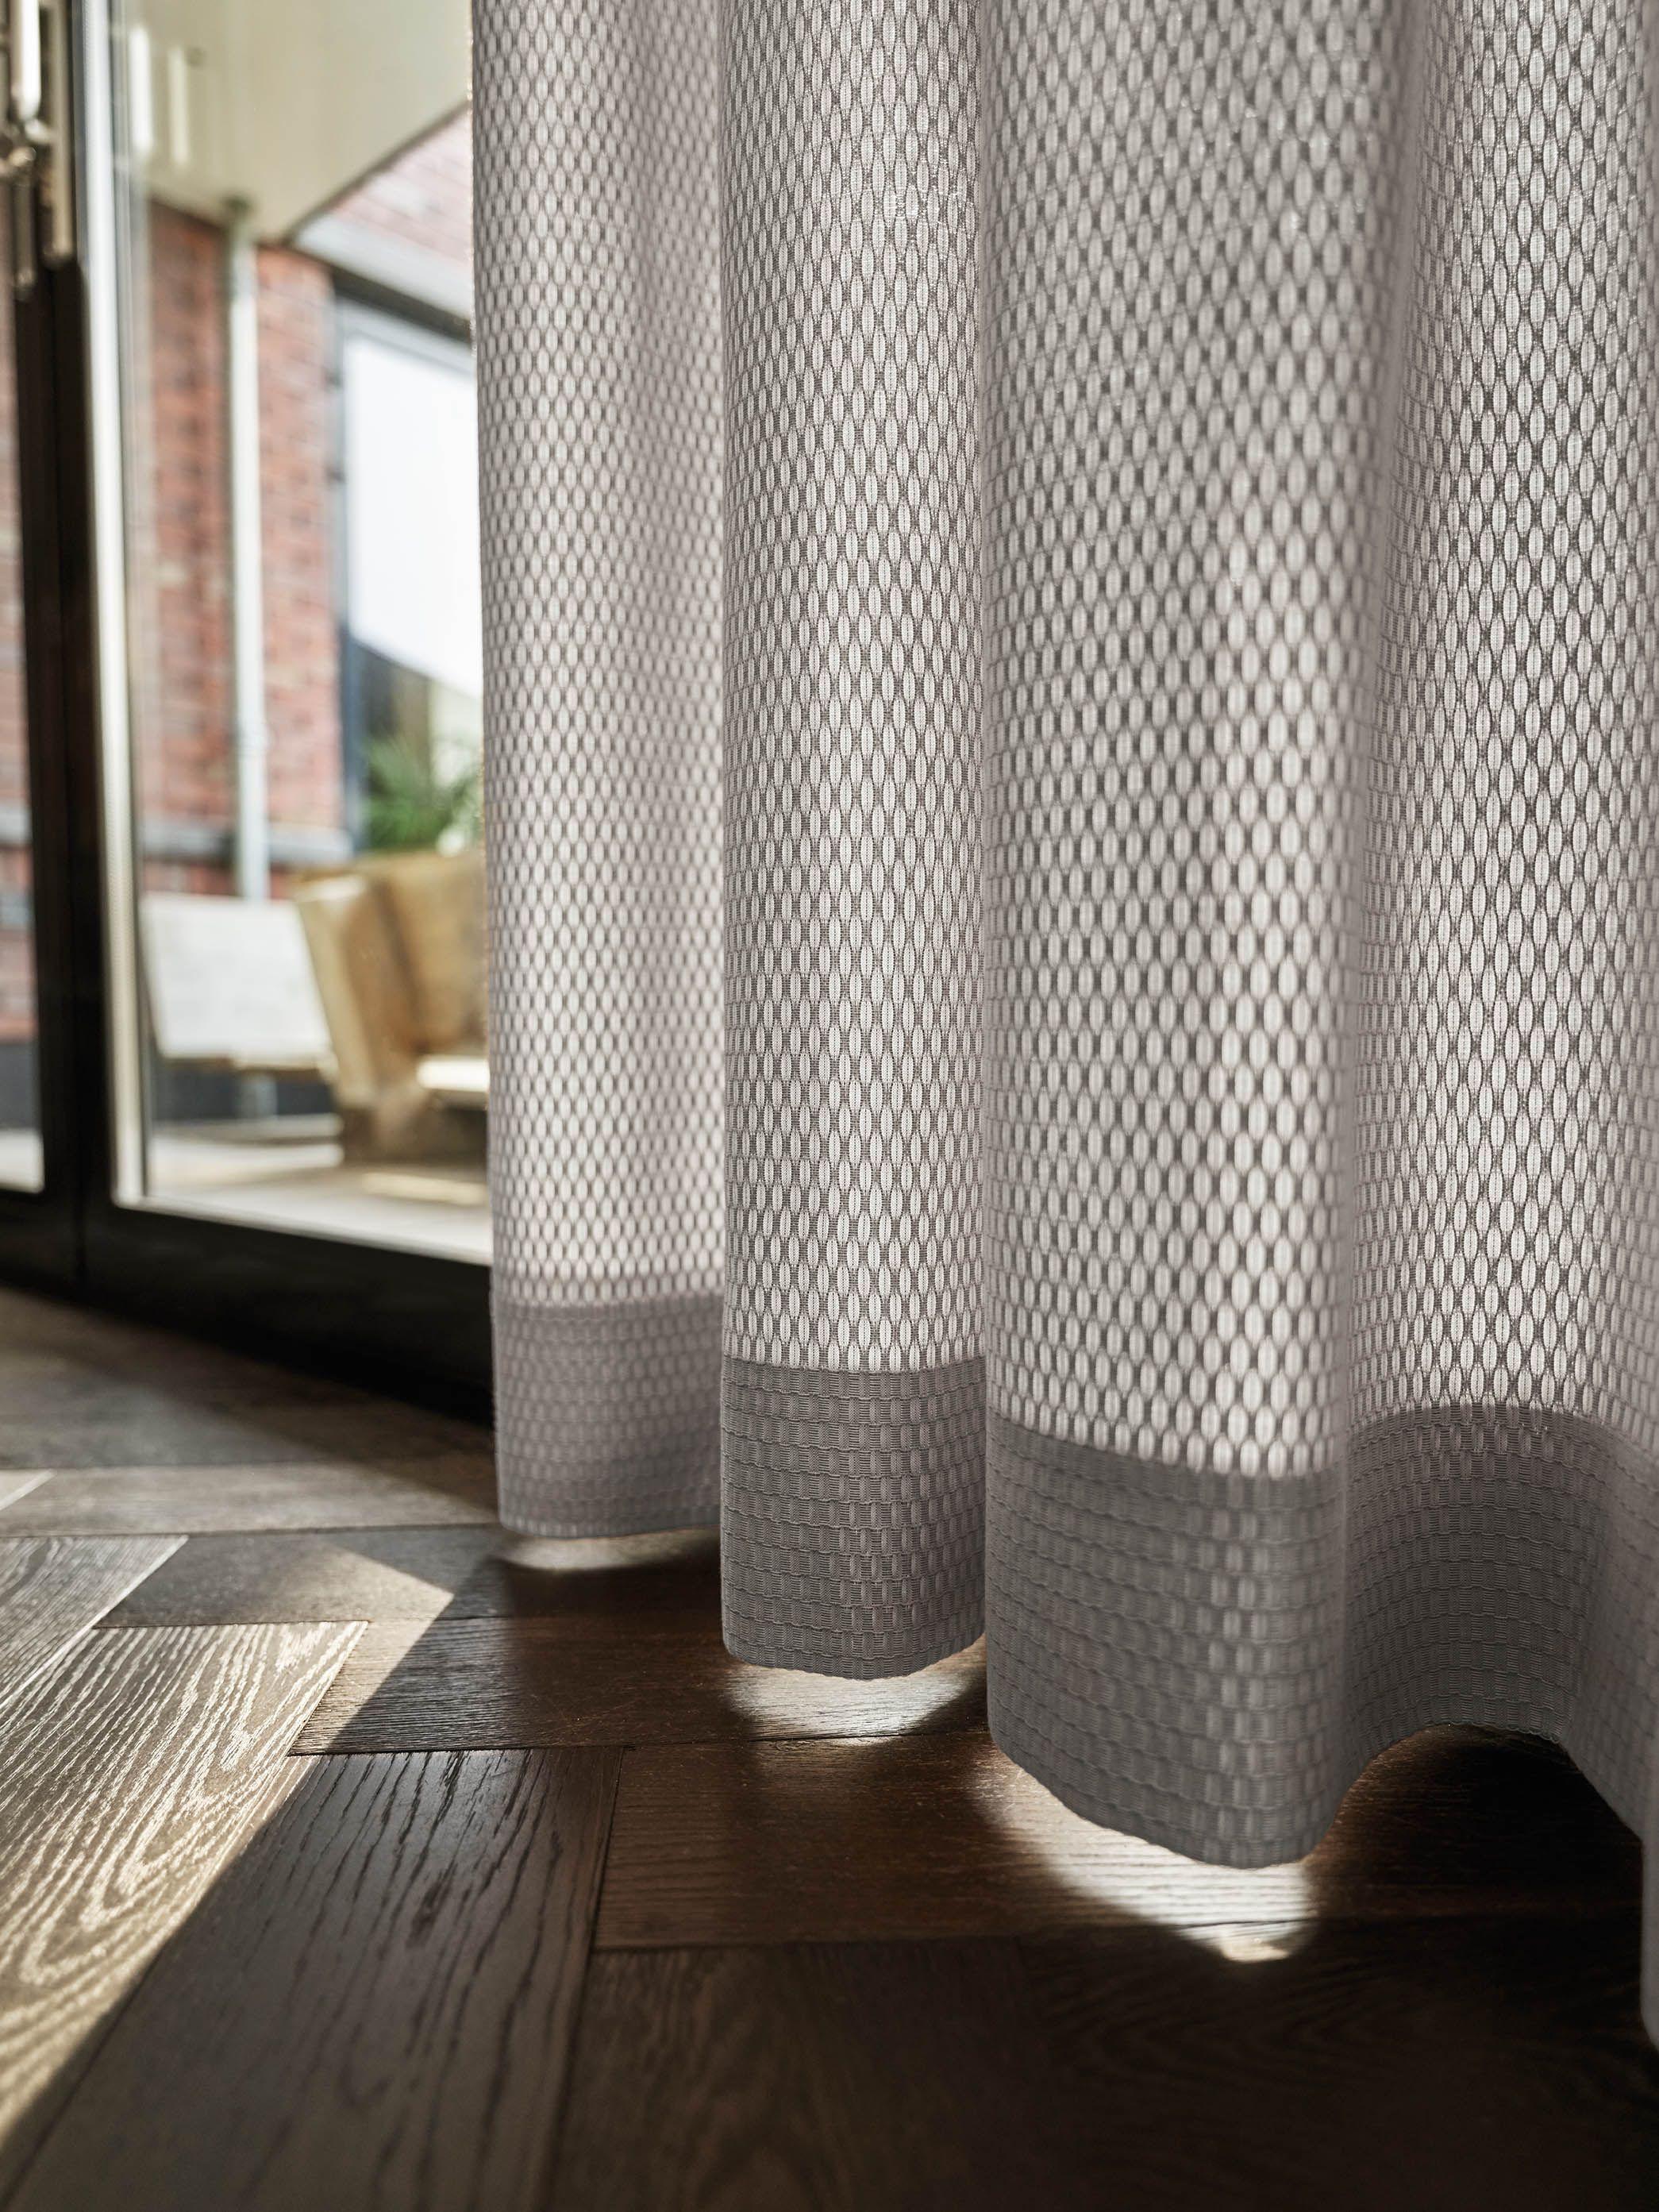 curtains fabric dekostoffe mbelstoffe gordijnen stoffen basics plains